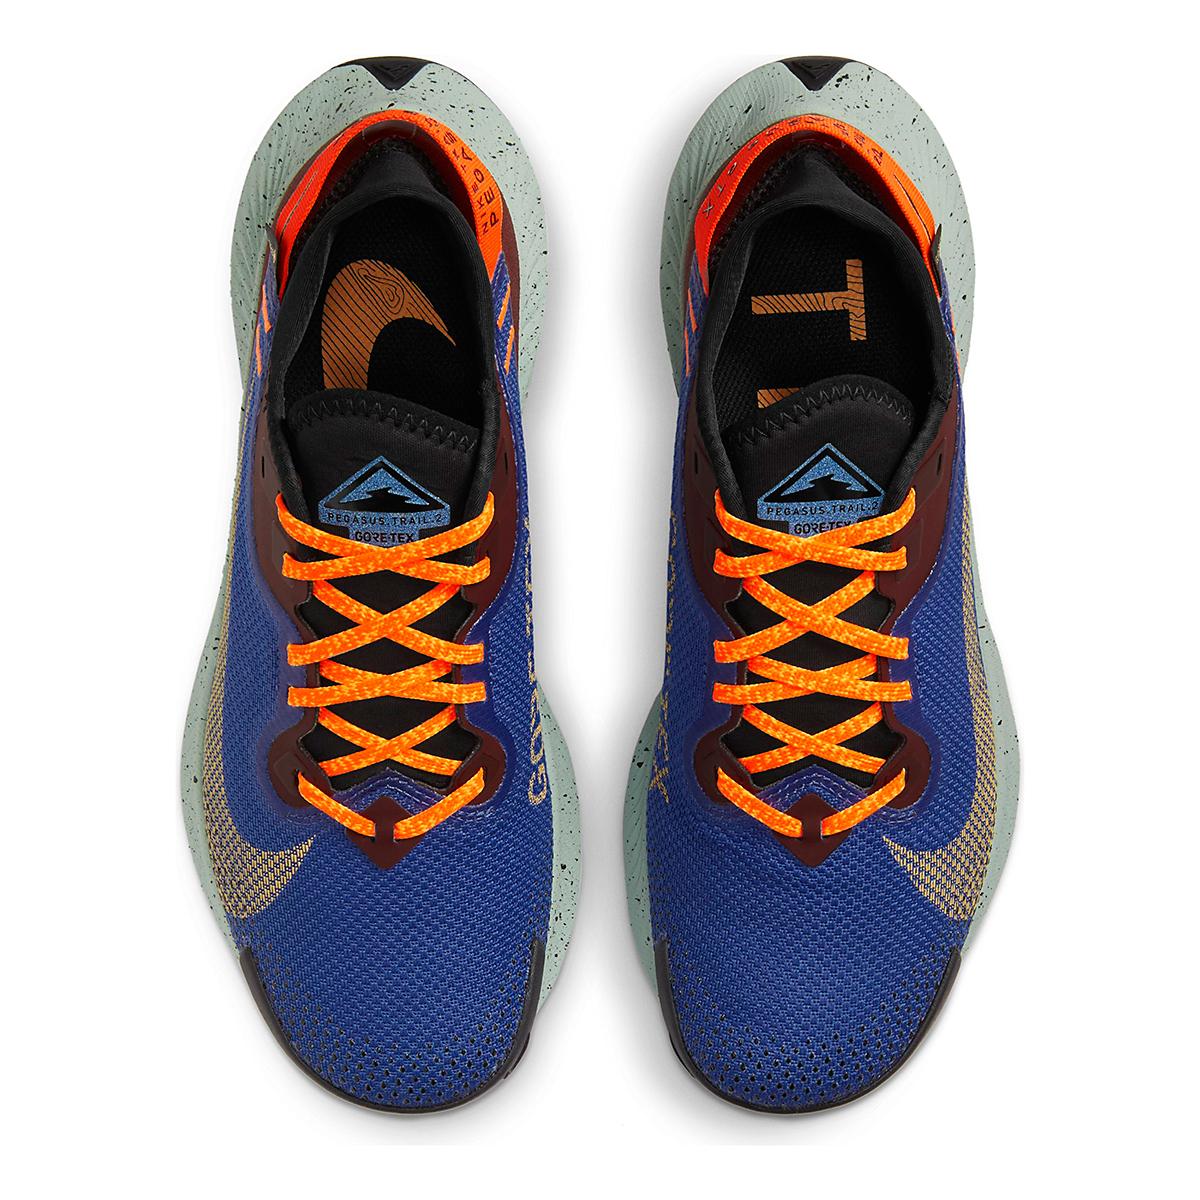 Women's Nike Pegasus Trail 2 Gore-Tex Trail Running Shoe - Color: Mystic Dates/Laser Orange/ Astronomy Blue - Size: 5 - Width: Regular, Mystic Dates/Laser Orange/ Astronomy Blue, large, image 4